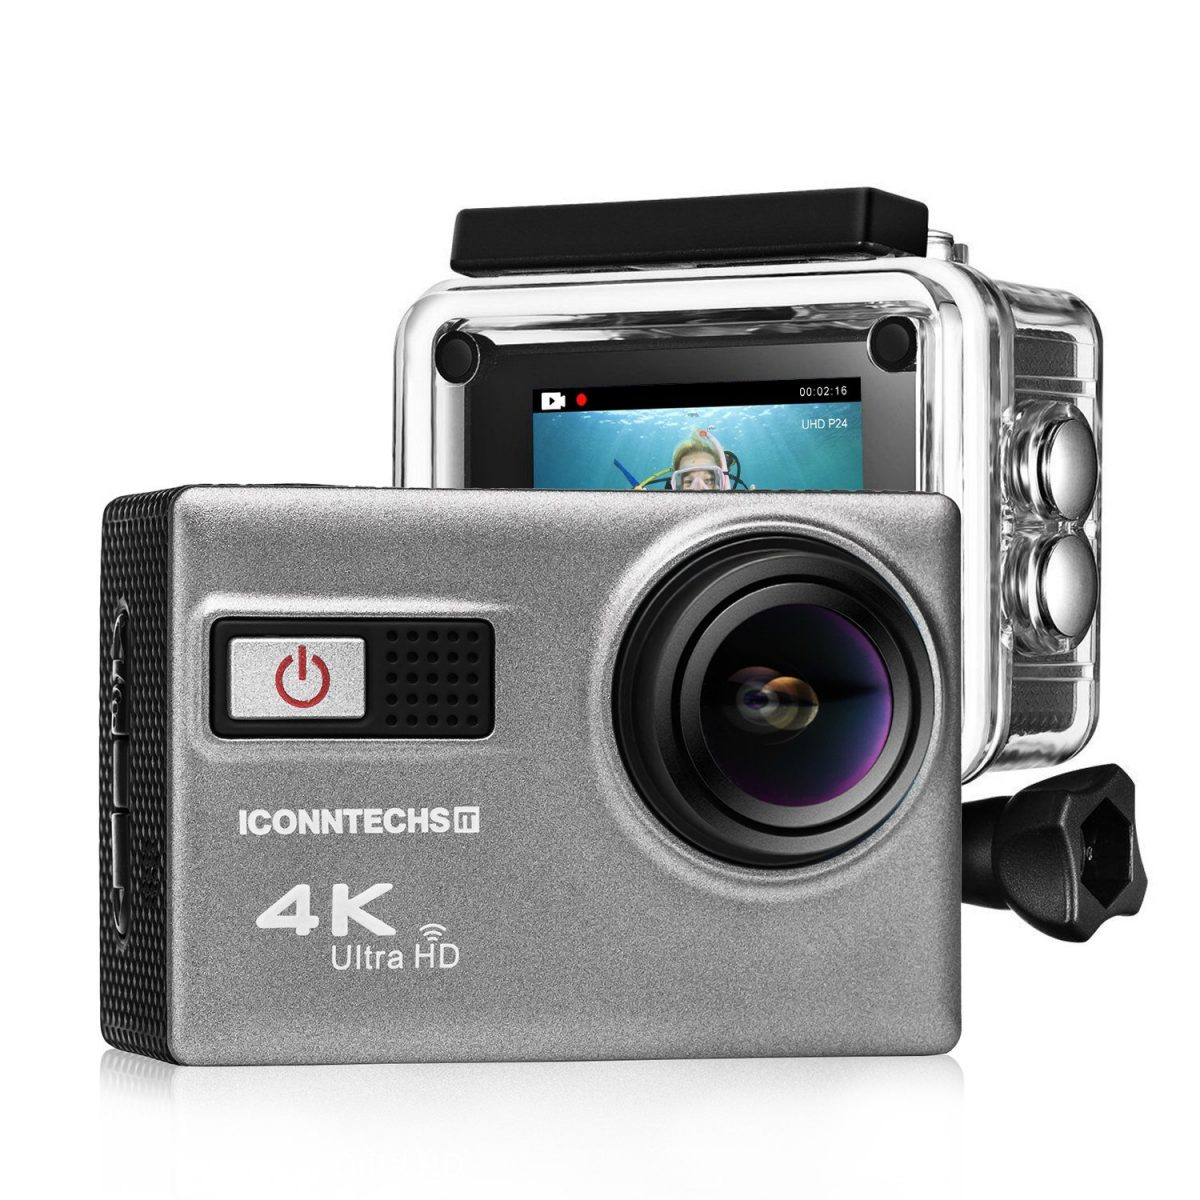 ICONNTECHS IT Action Camera 4K amazon offerta codice sconto